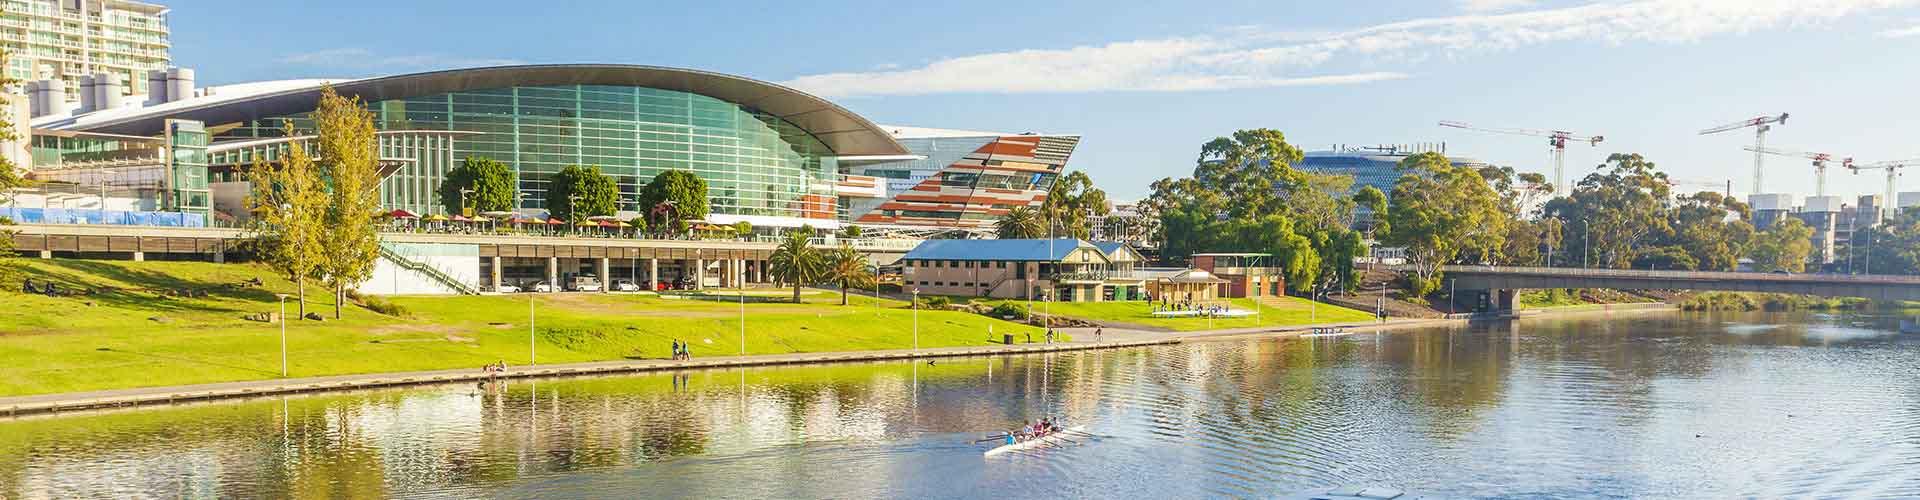 Adelaide - Hostelů v Adelaide. Mapy pro Adelaide, fotky a recenze pro každý hostel v Adelaide.